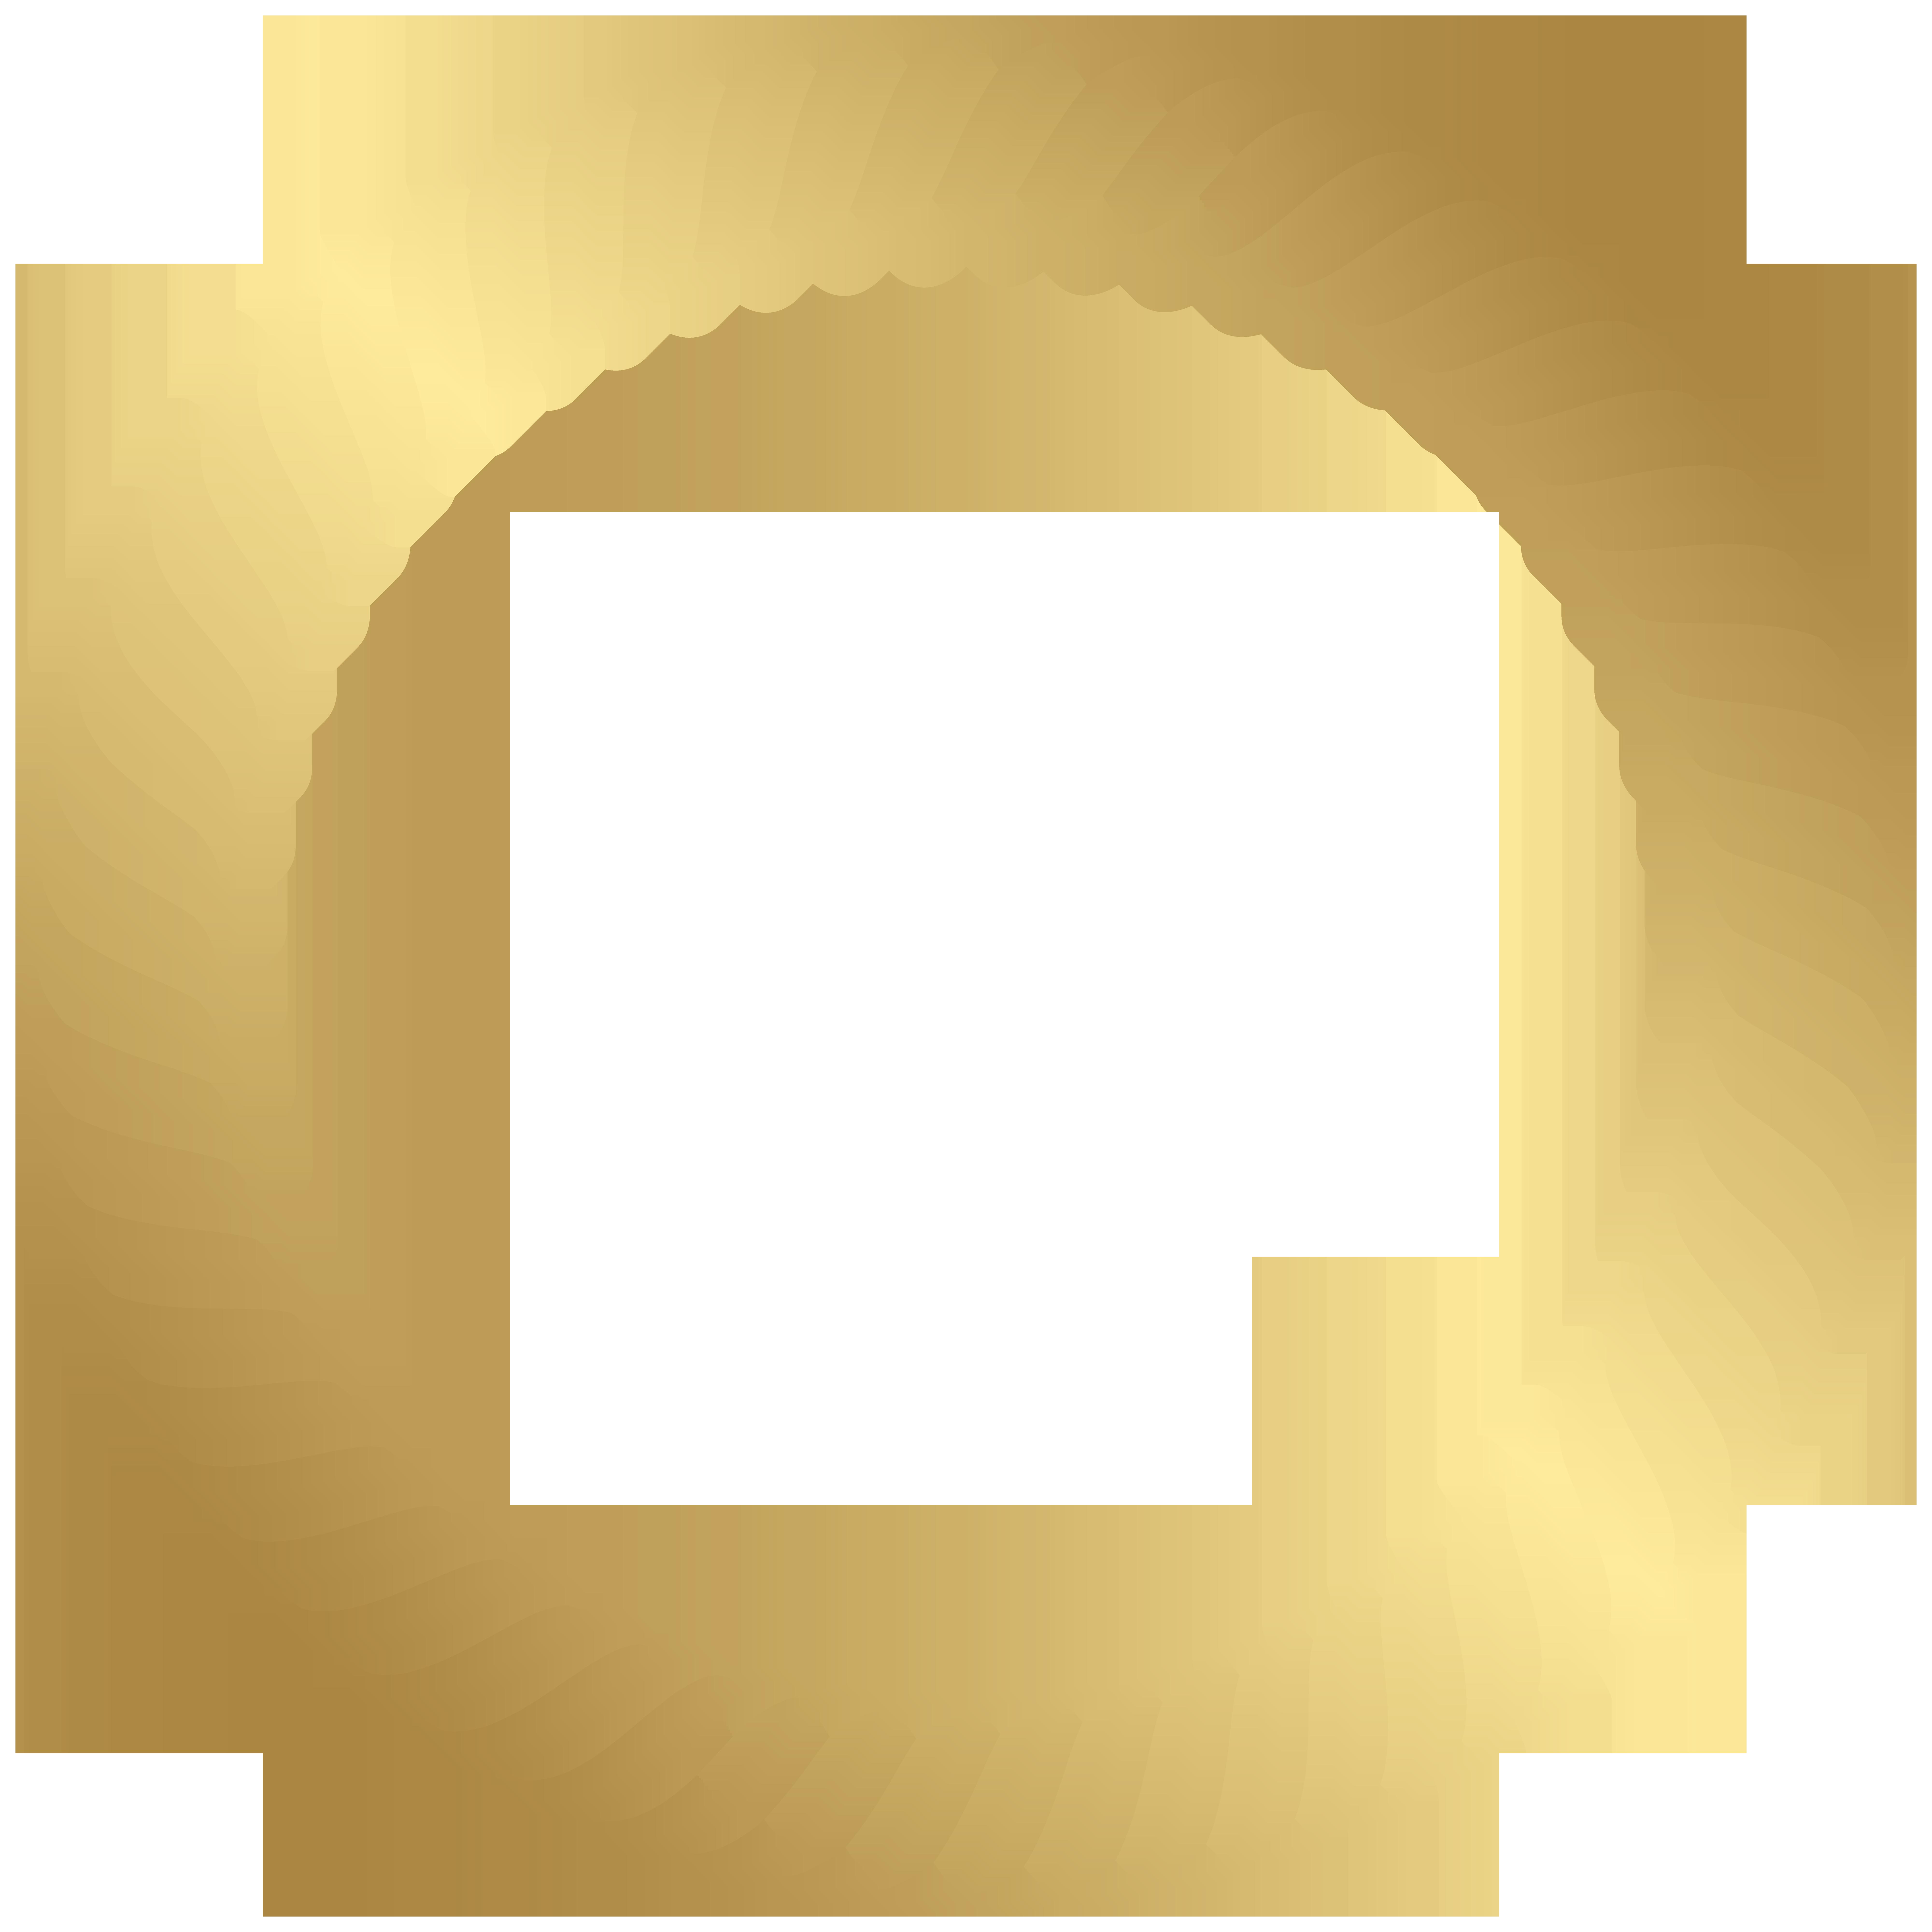 Circle clipart picture frame. Frames clip art transprent